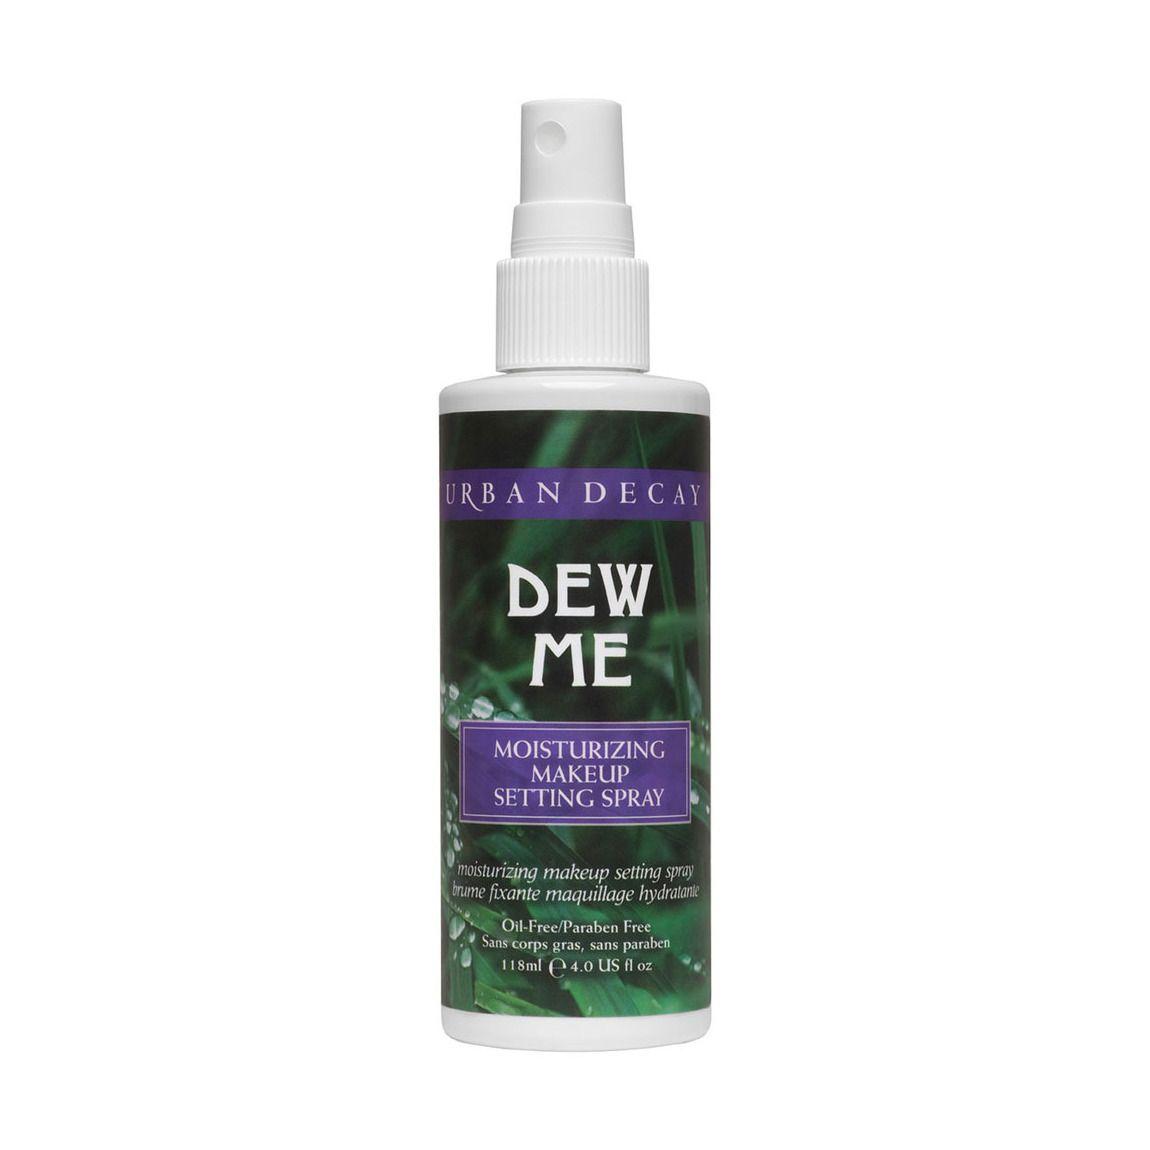 Urban Decay Dew Me Moisturizing Makeup Setting Spray